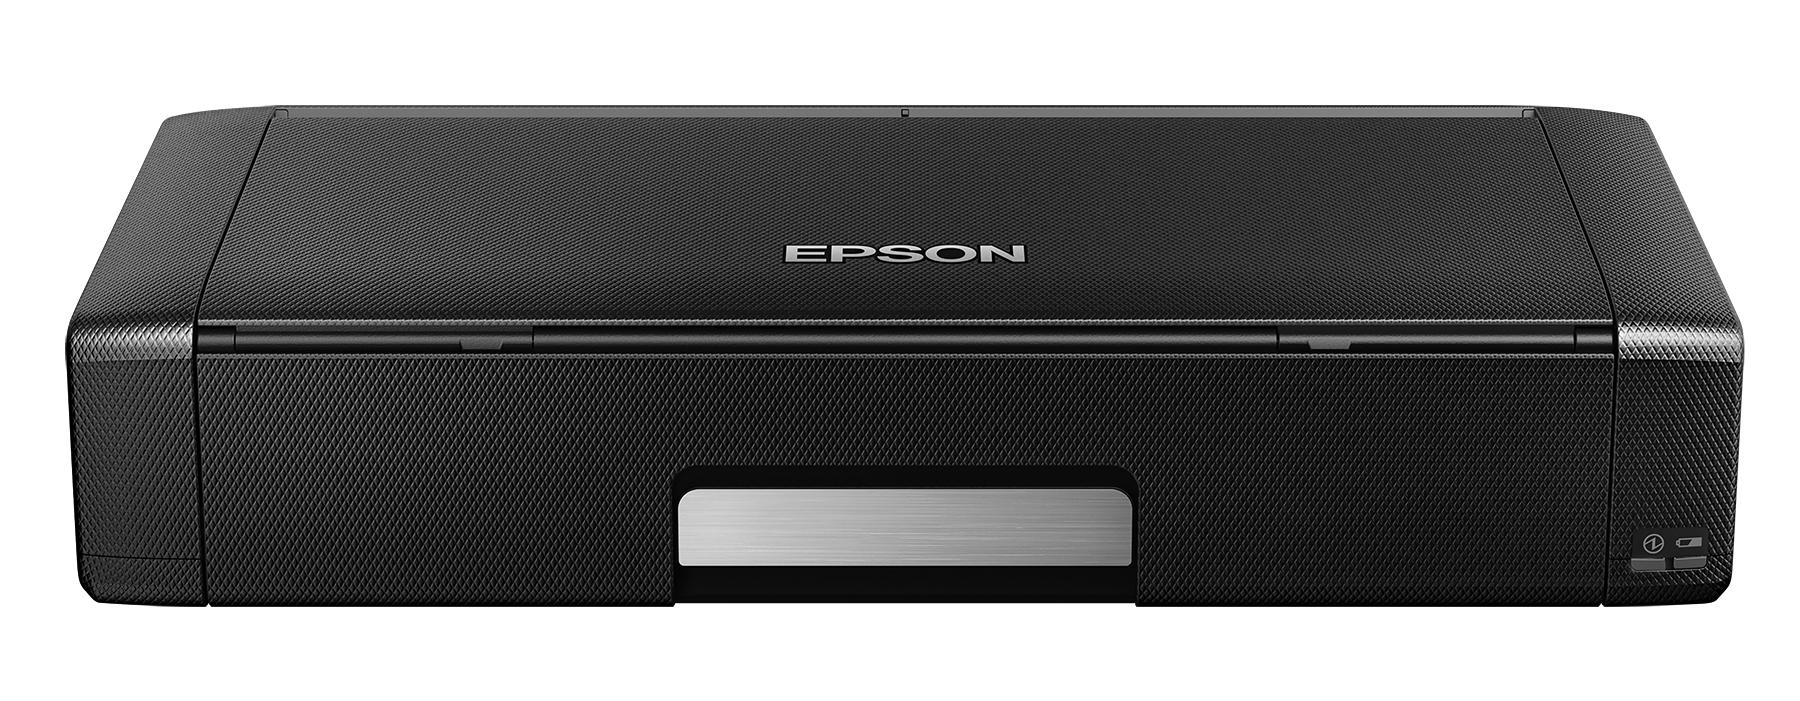 epson workforce wf 100 wireless mobile printer wi fi direct usb ebay. Black Bedroom Furniture Sets. Home Design Ideas